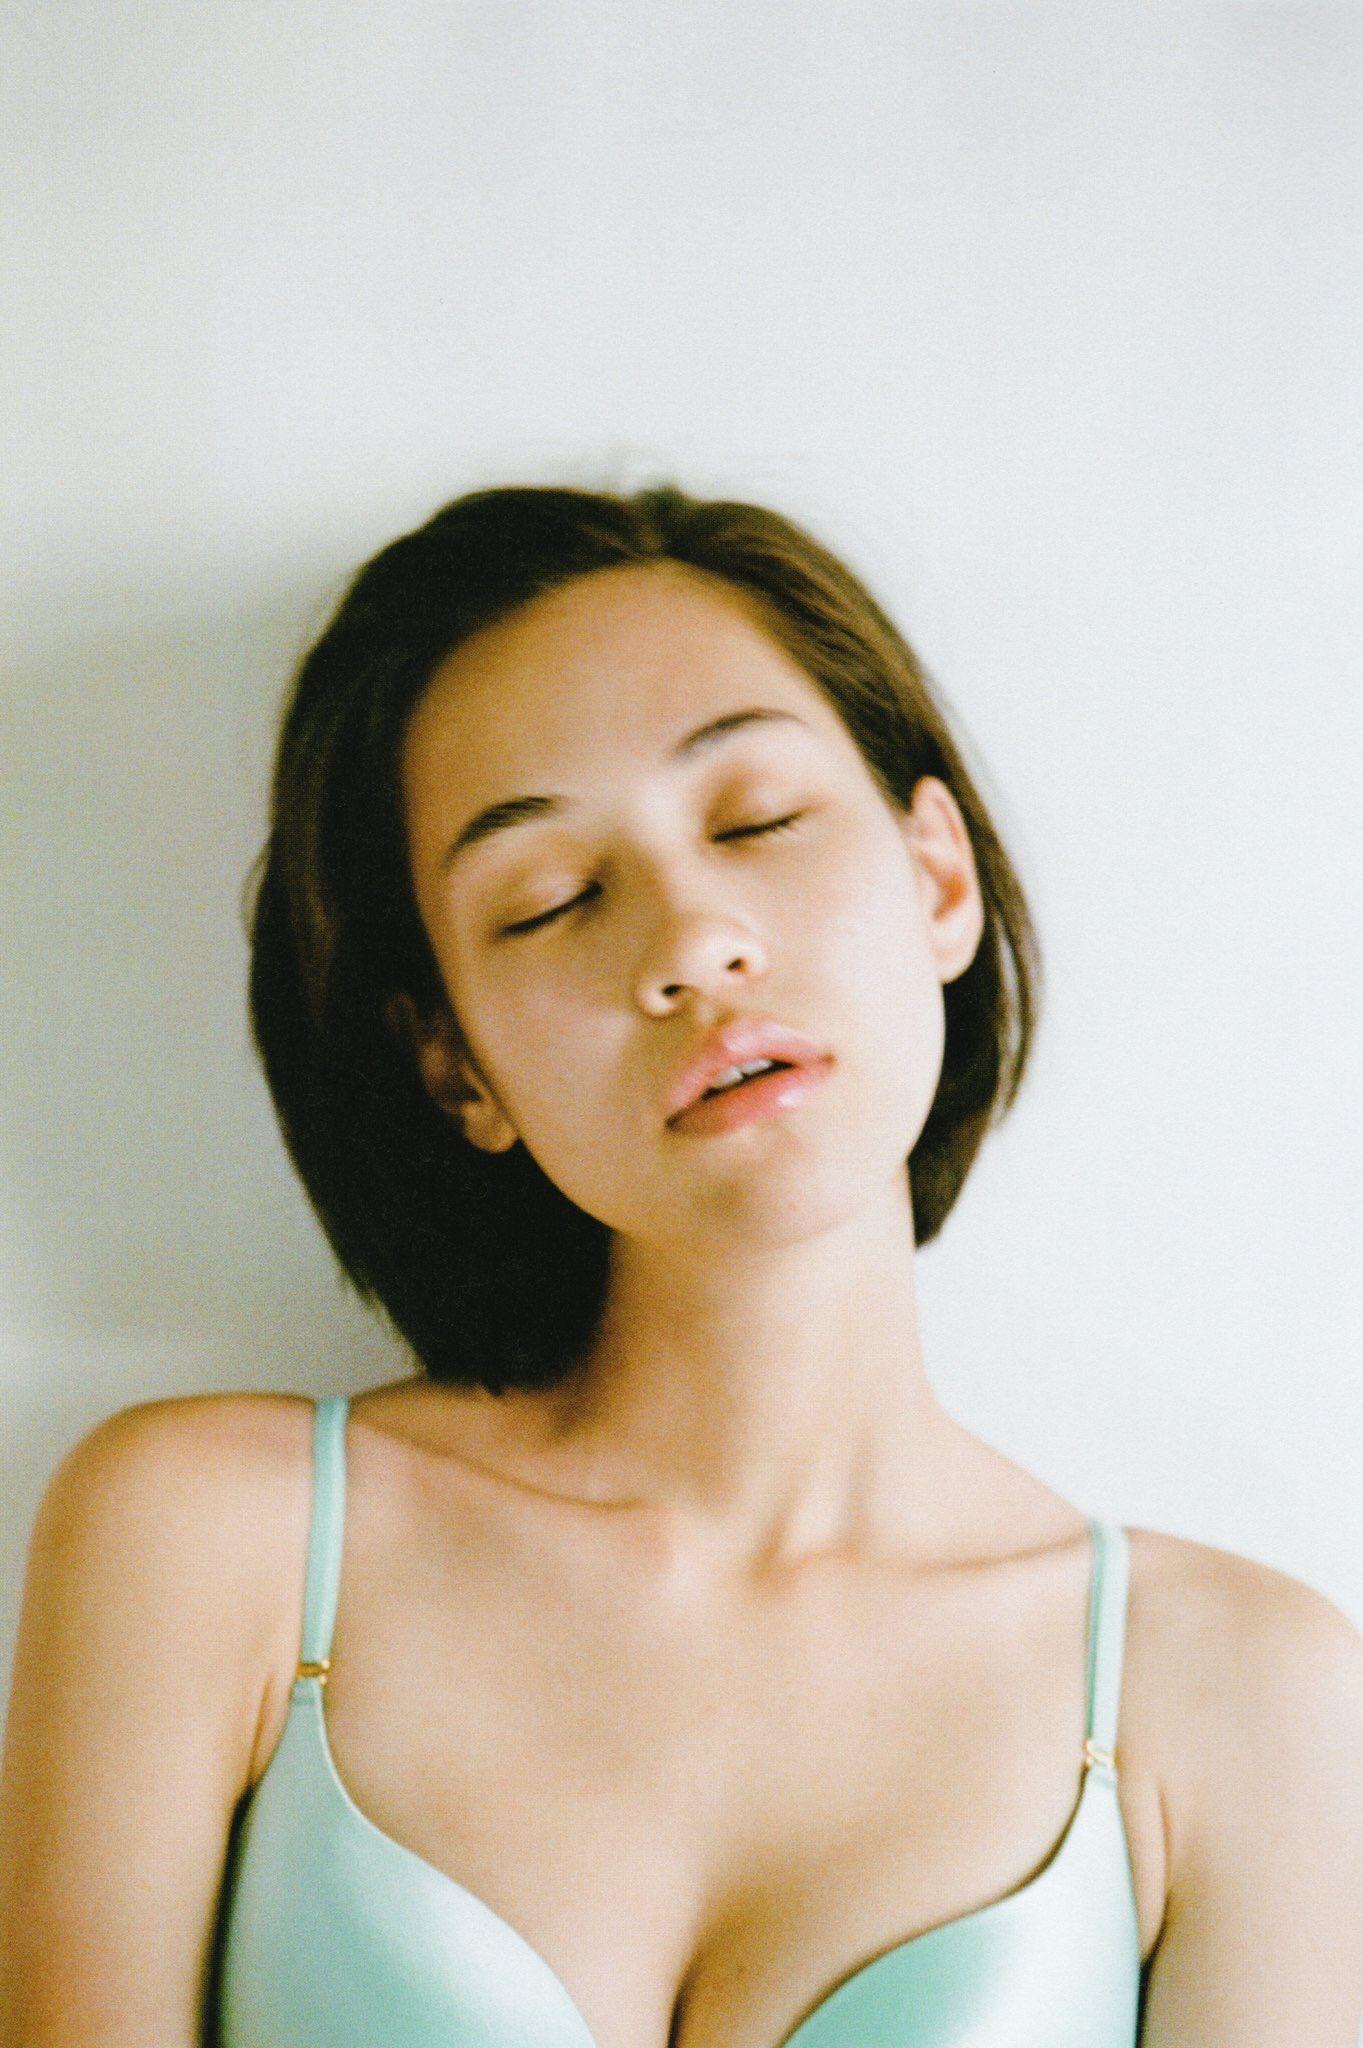 Cleavage Kiko Mizuhara nudes (86 photos), Pussy, Sideboobs, Boobs, braless 2006